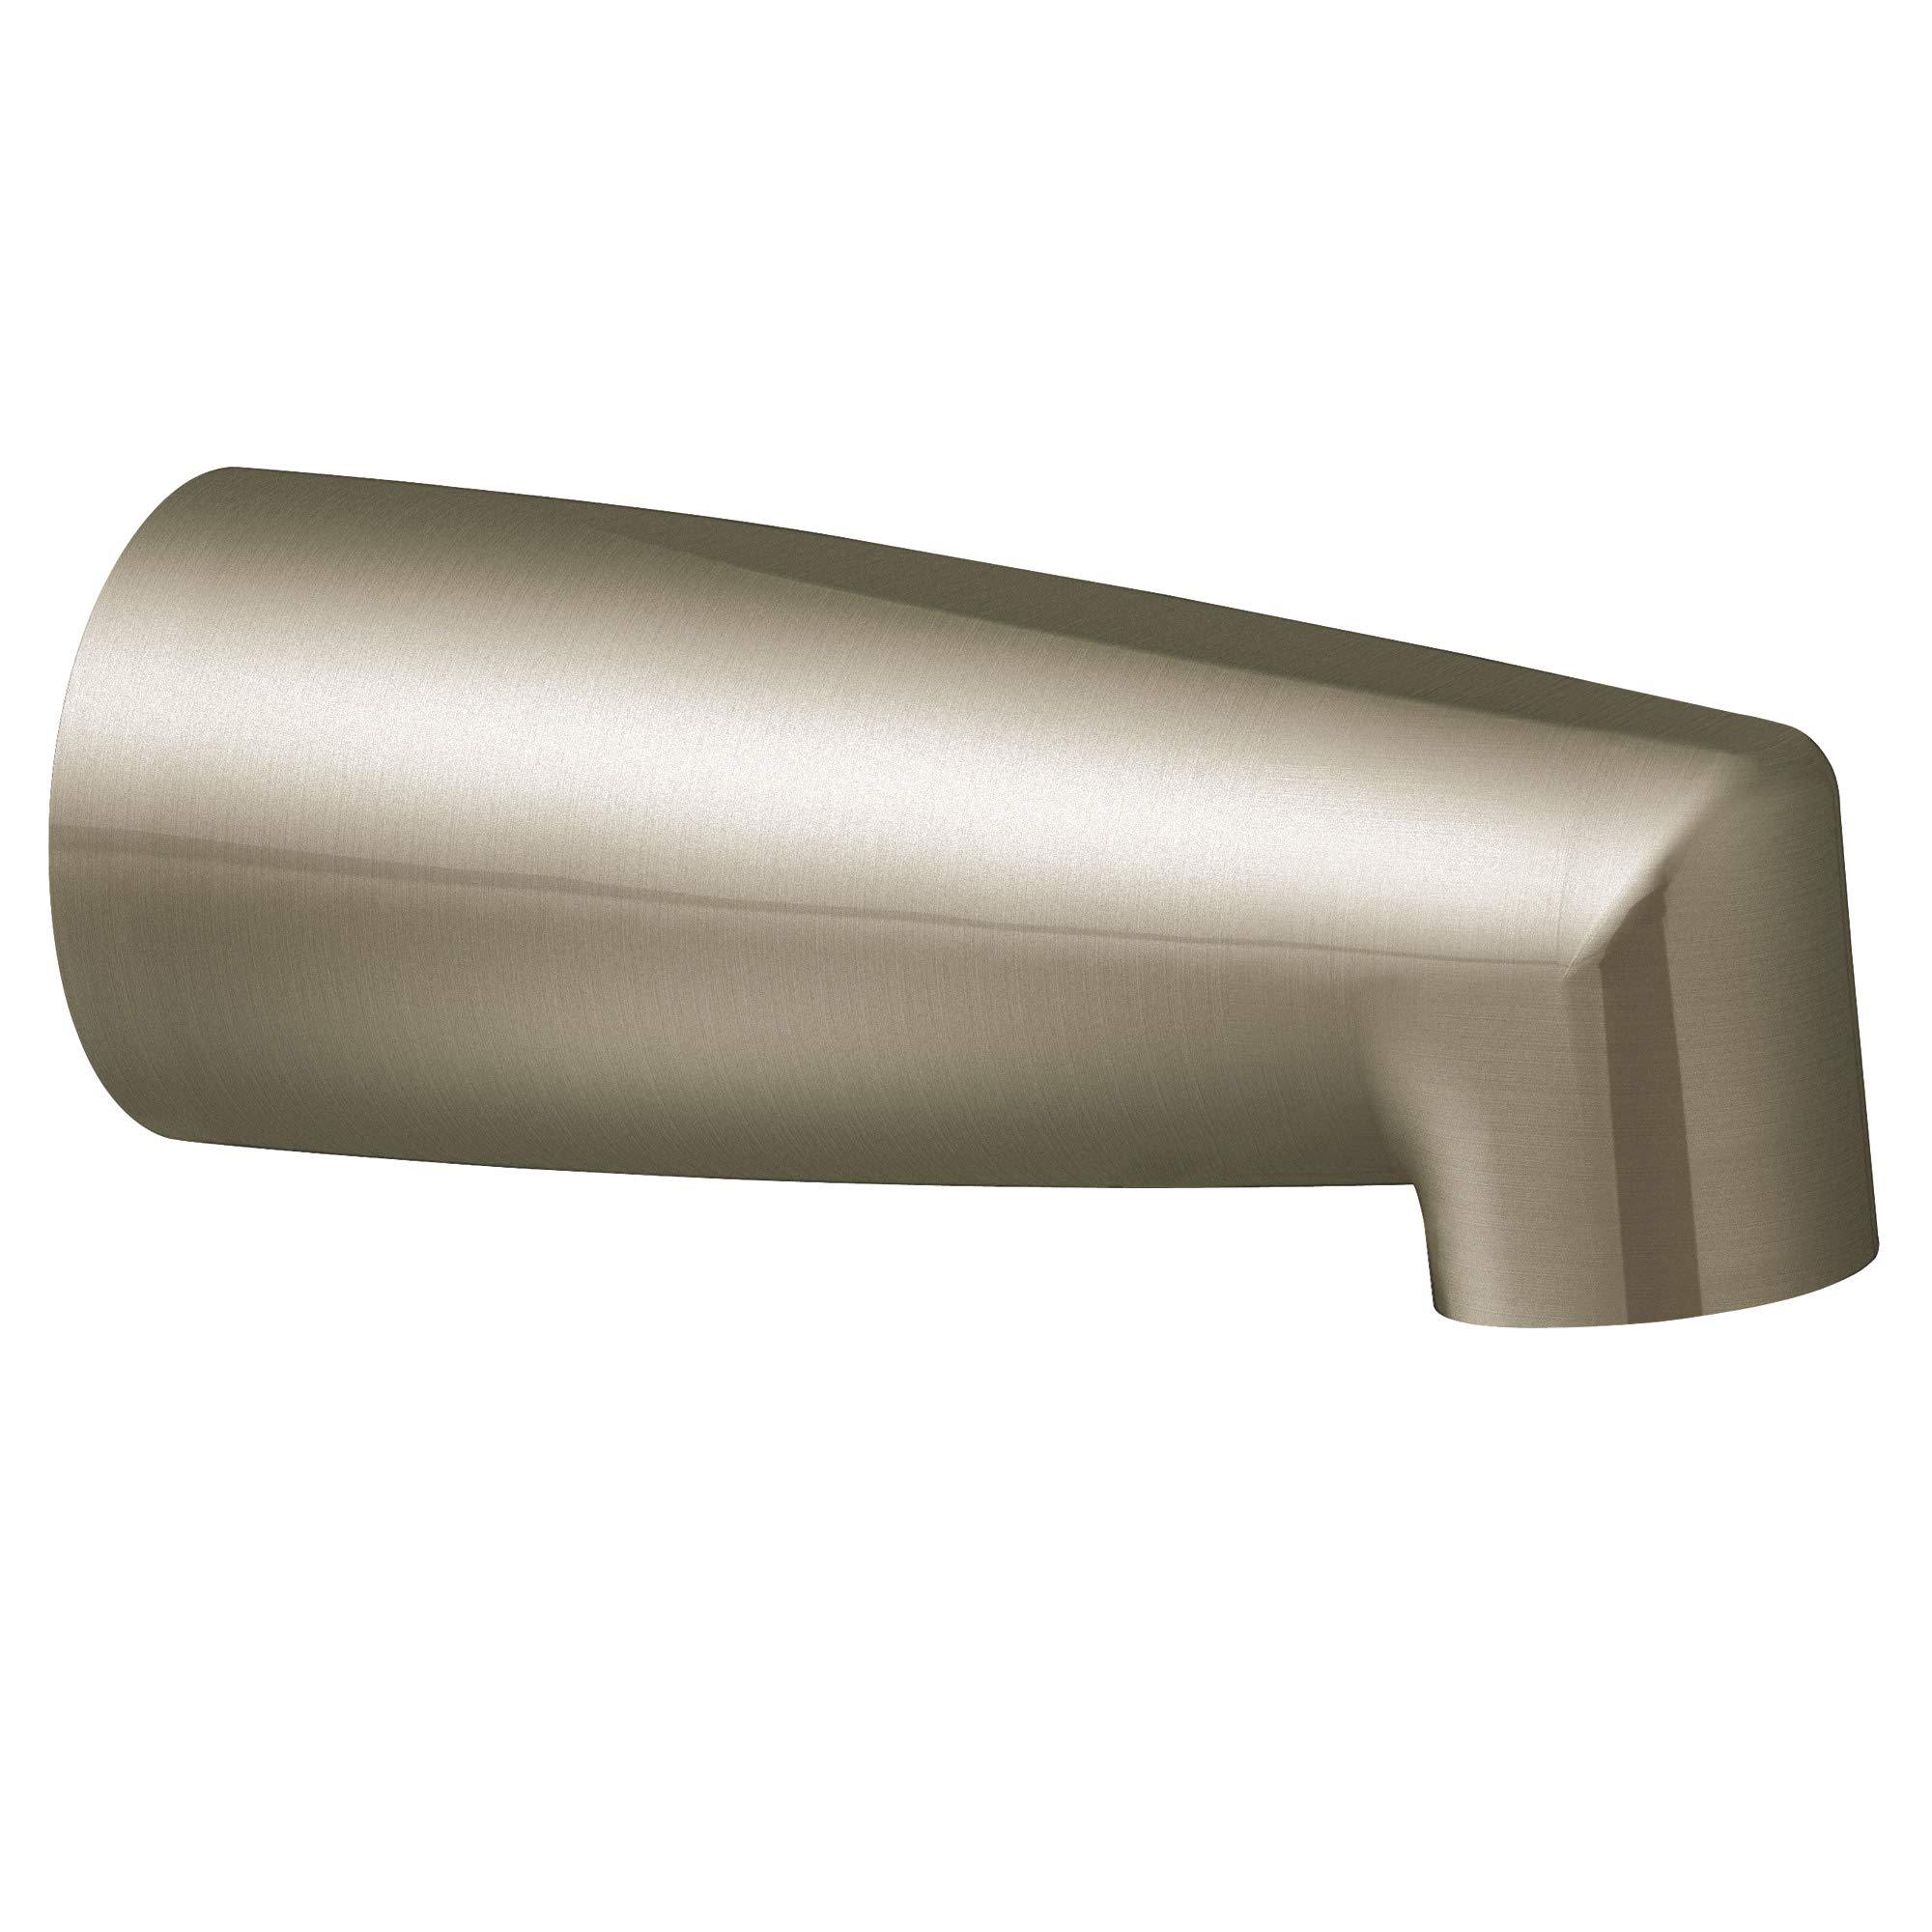 Moen 3829BN Non-Diverter 1/2-Inch CC Slip-Fit Tub Filler Spout, Brushed Nickel by Moen